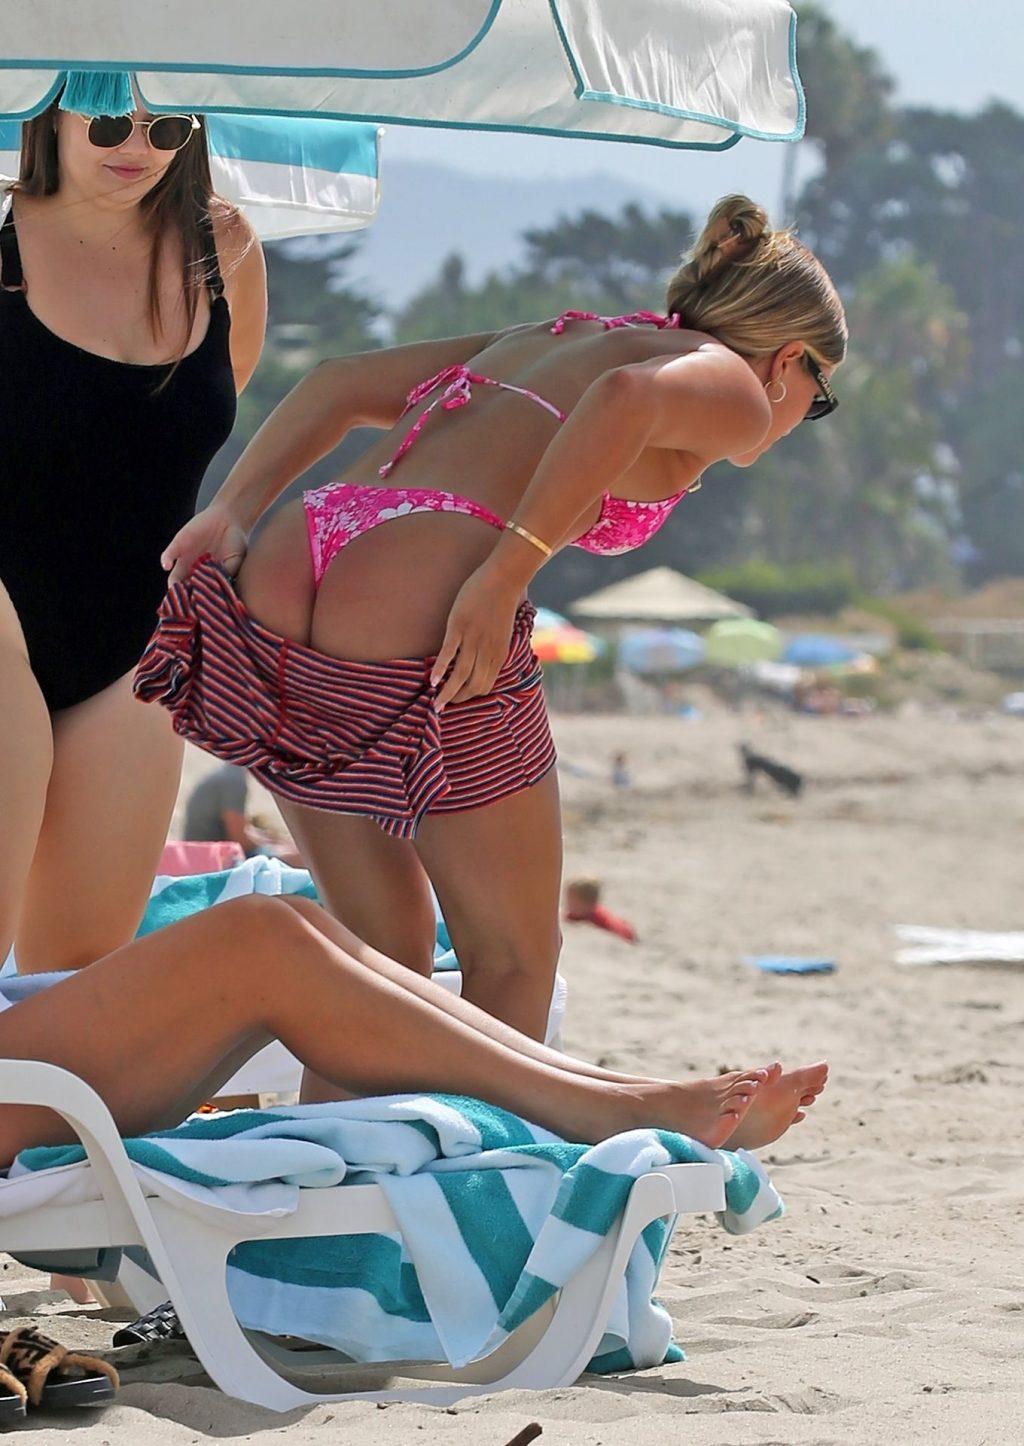 Sofia Richie Shows Off Her Curves on the Beach in Santa Barbara (15 Photos)